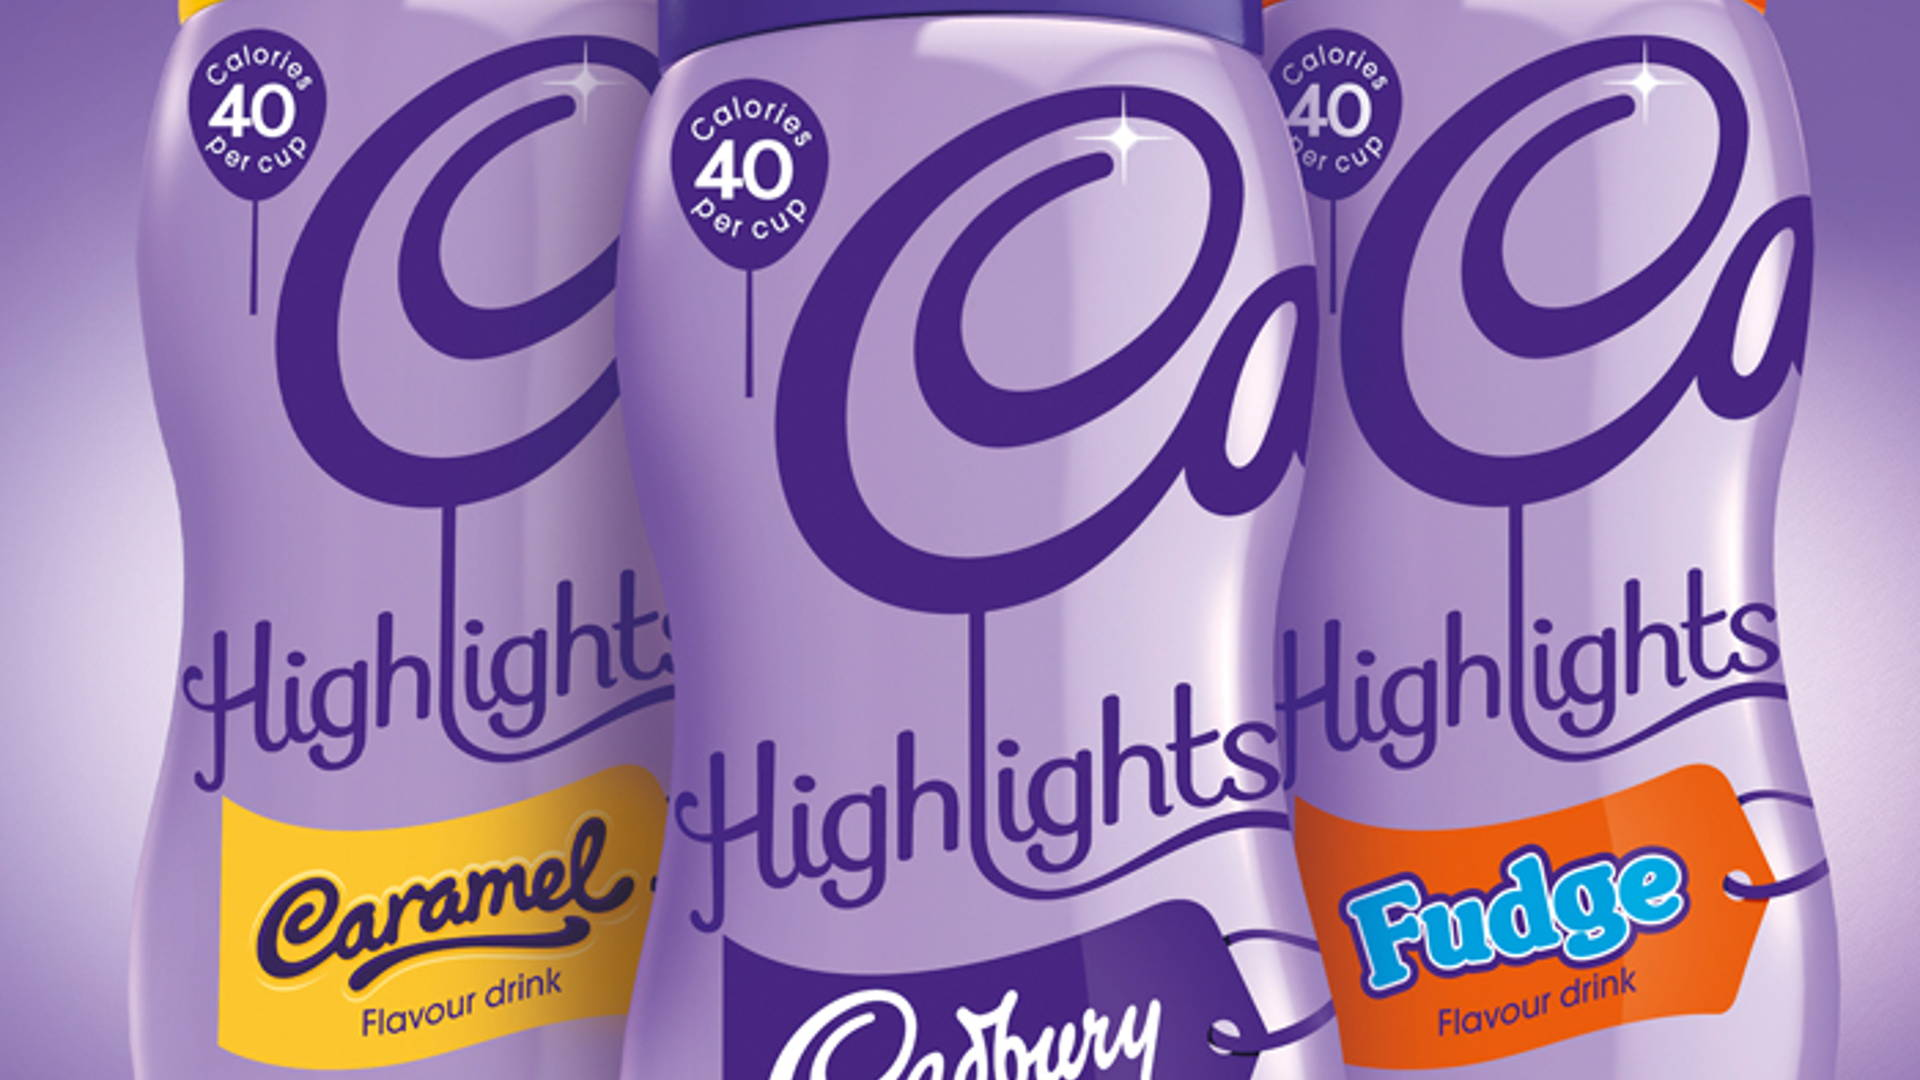 Cadbury Hot Chocolate Dieline